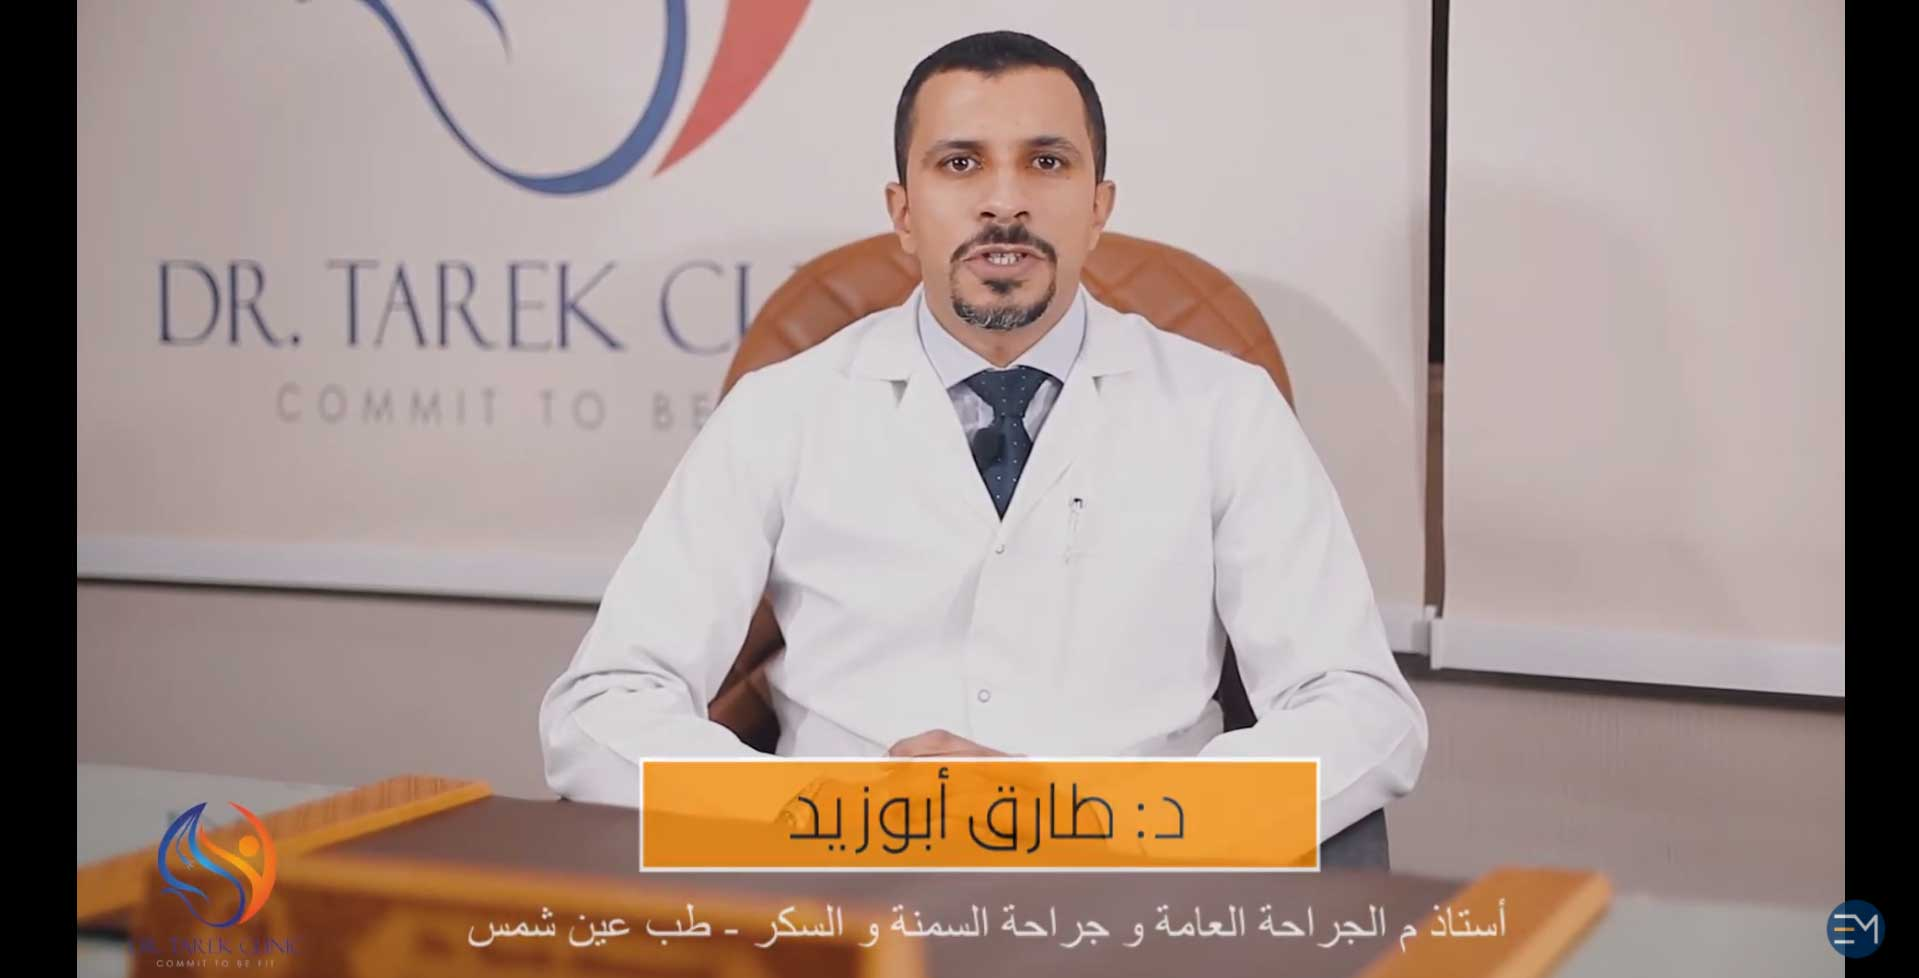 Dr Tarek Clinic 2 - إنتاج الفيديوهات -